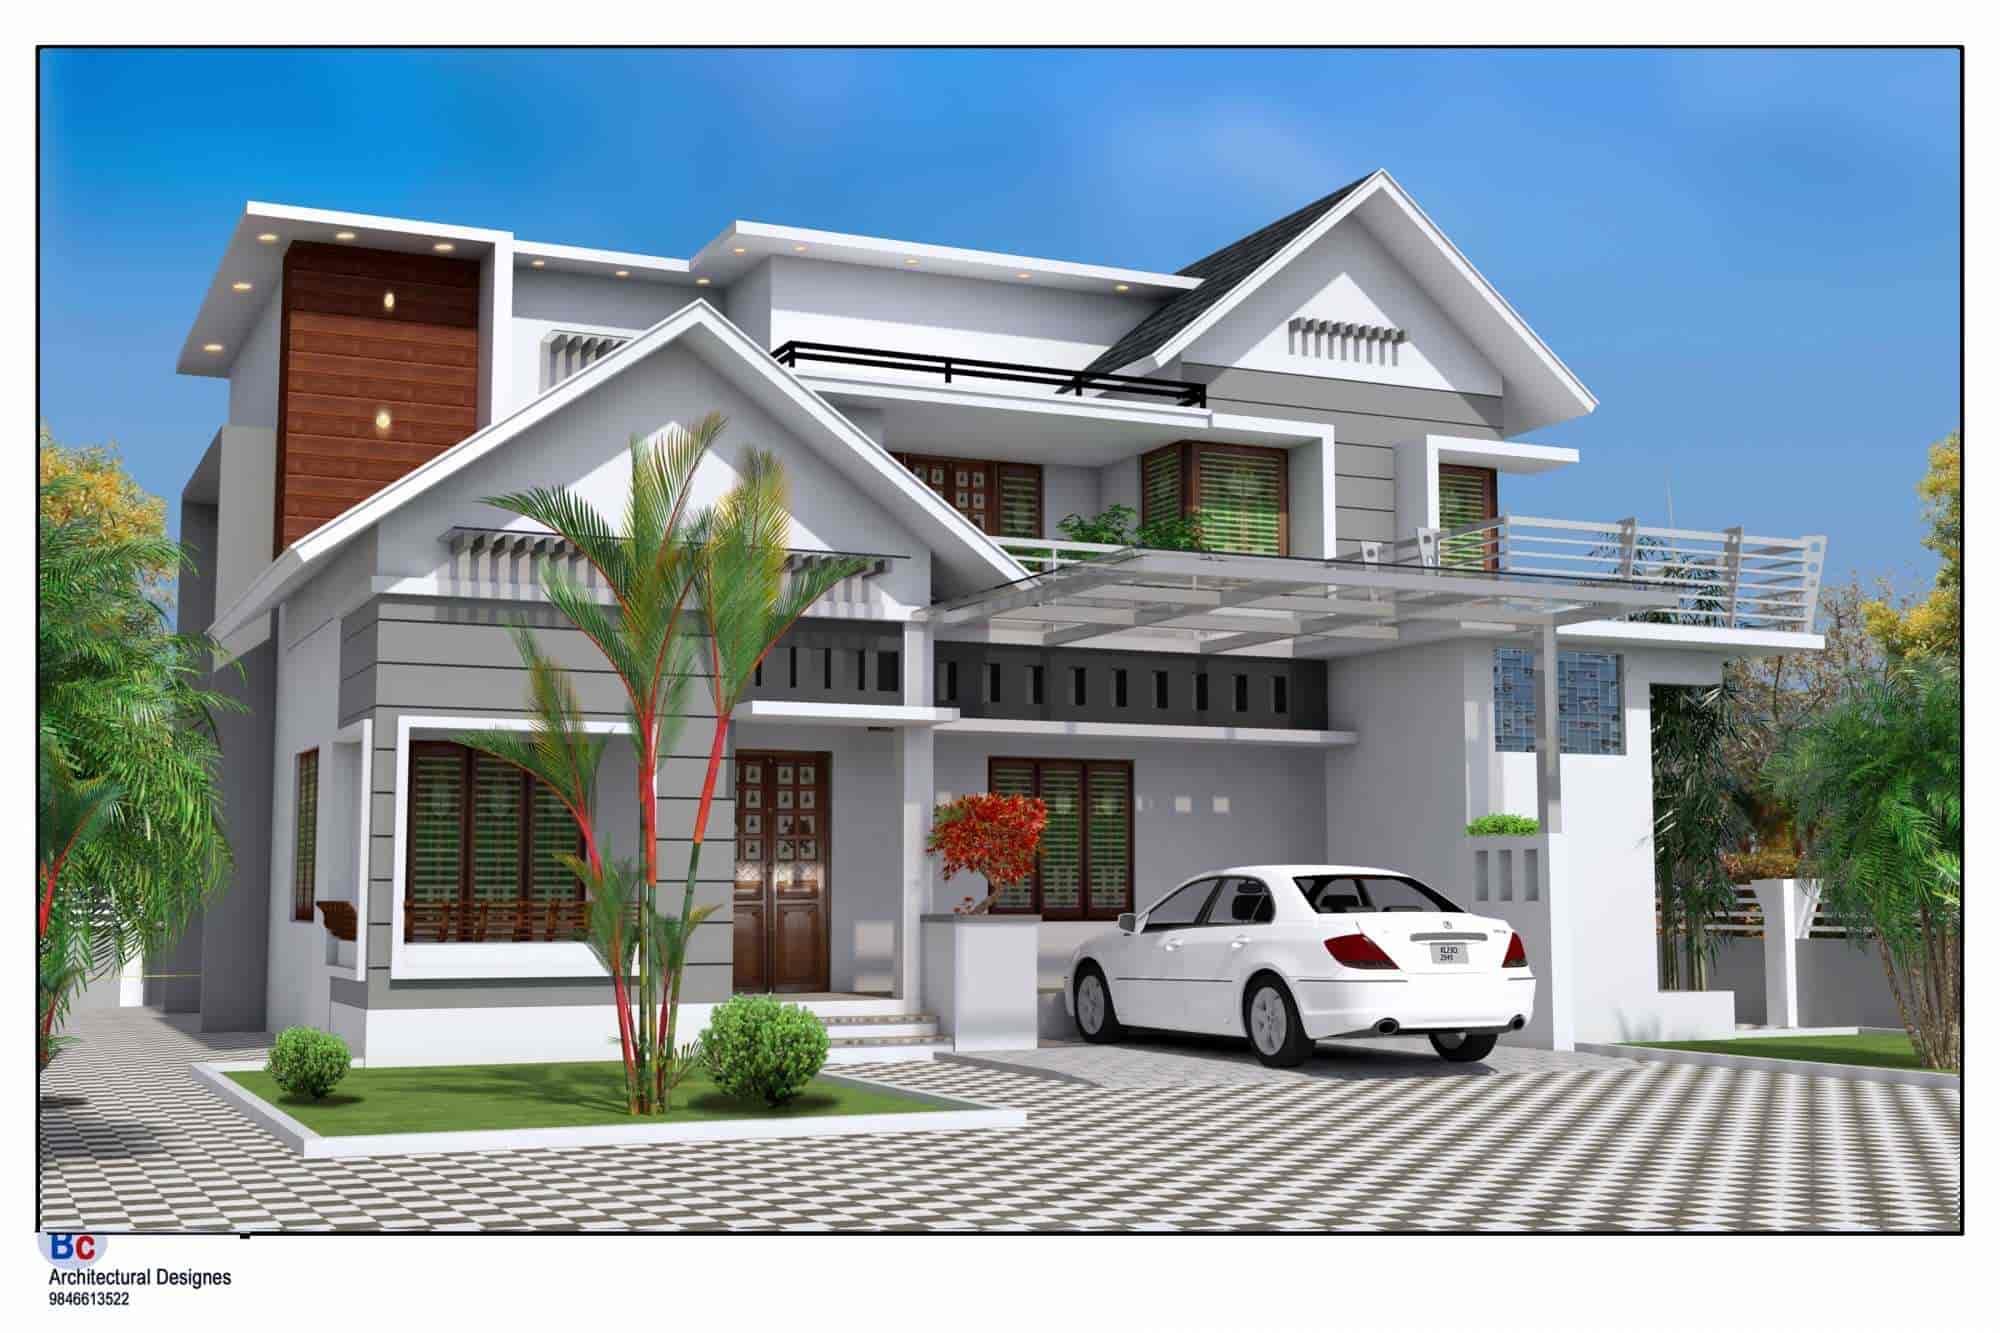 B c architectural designs